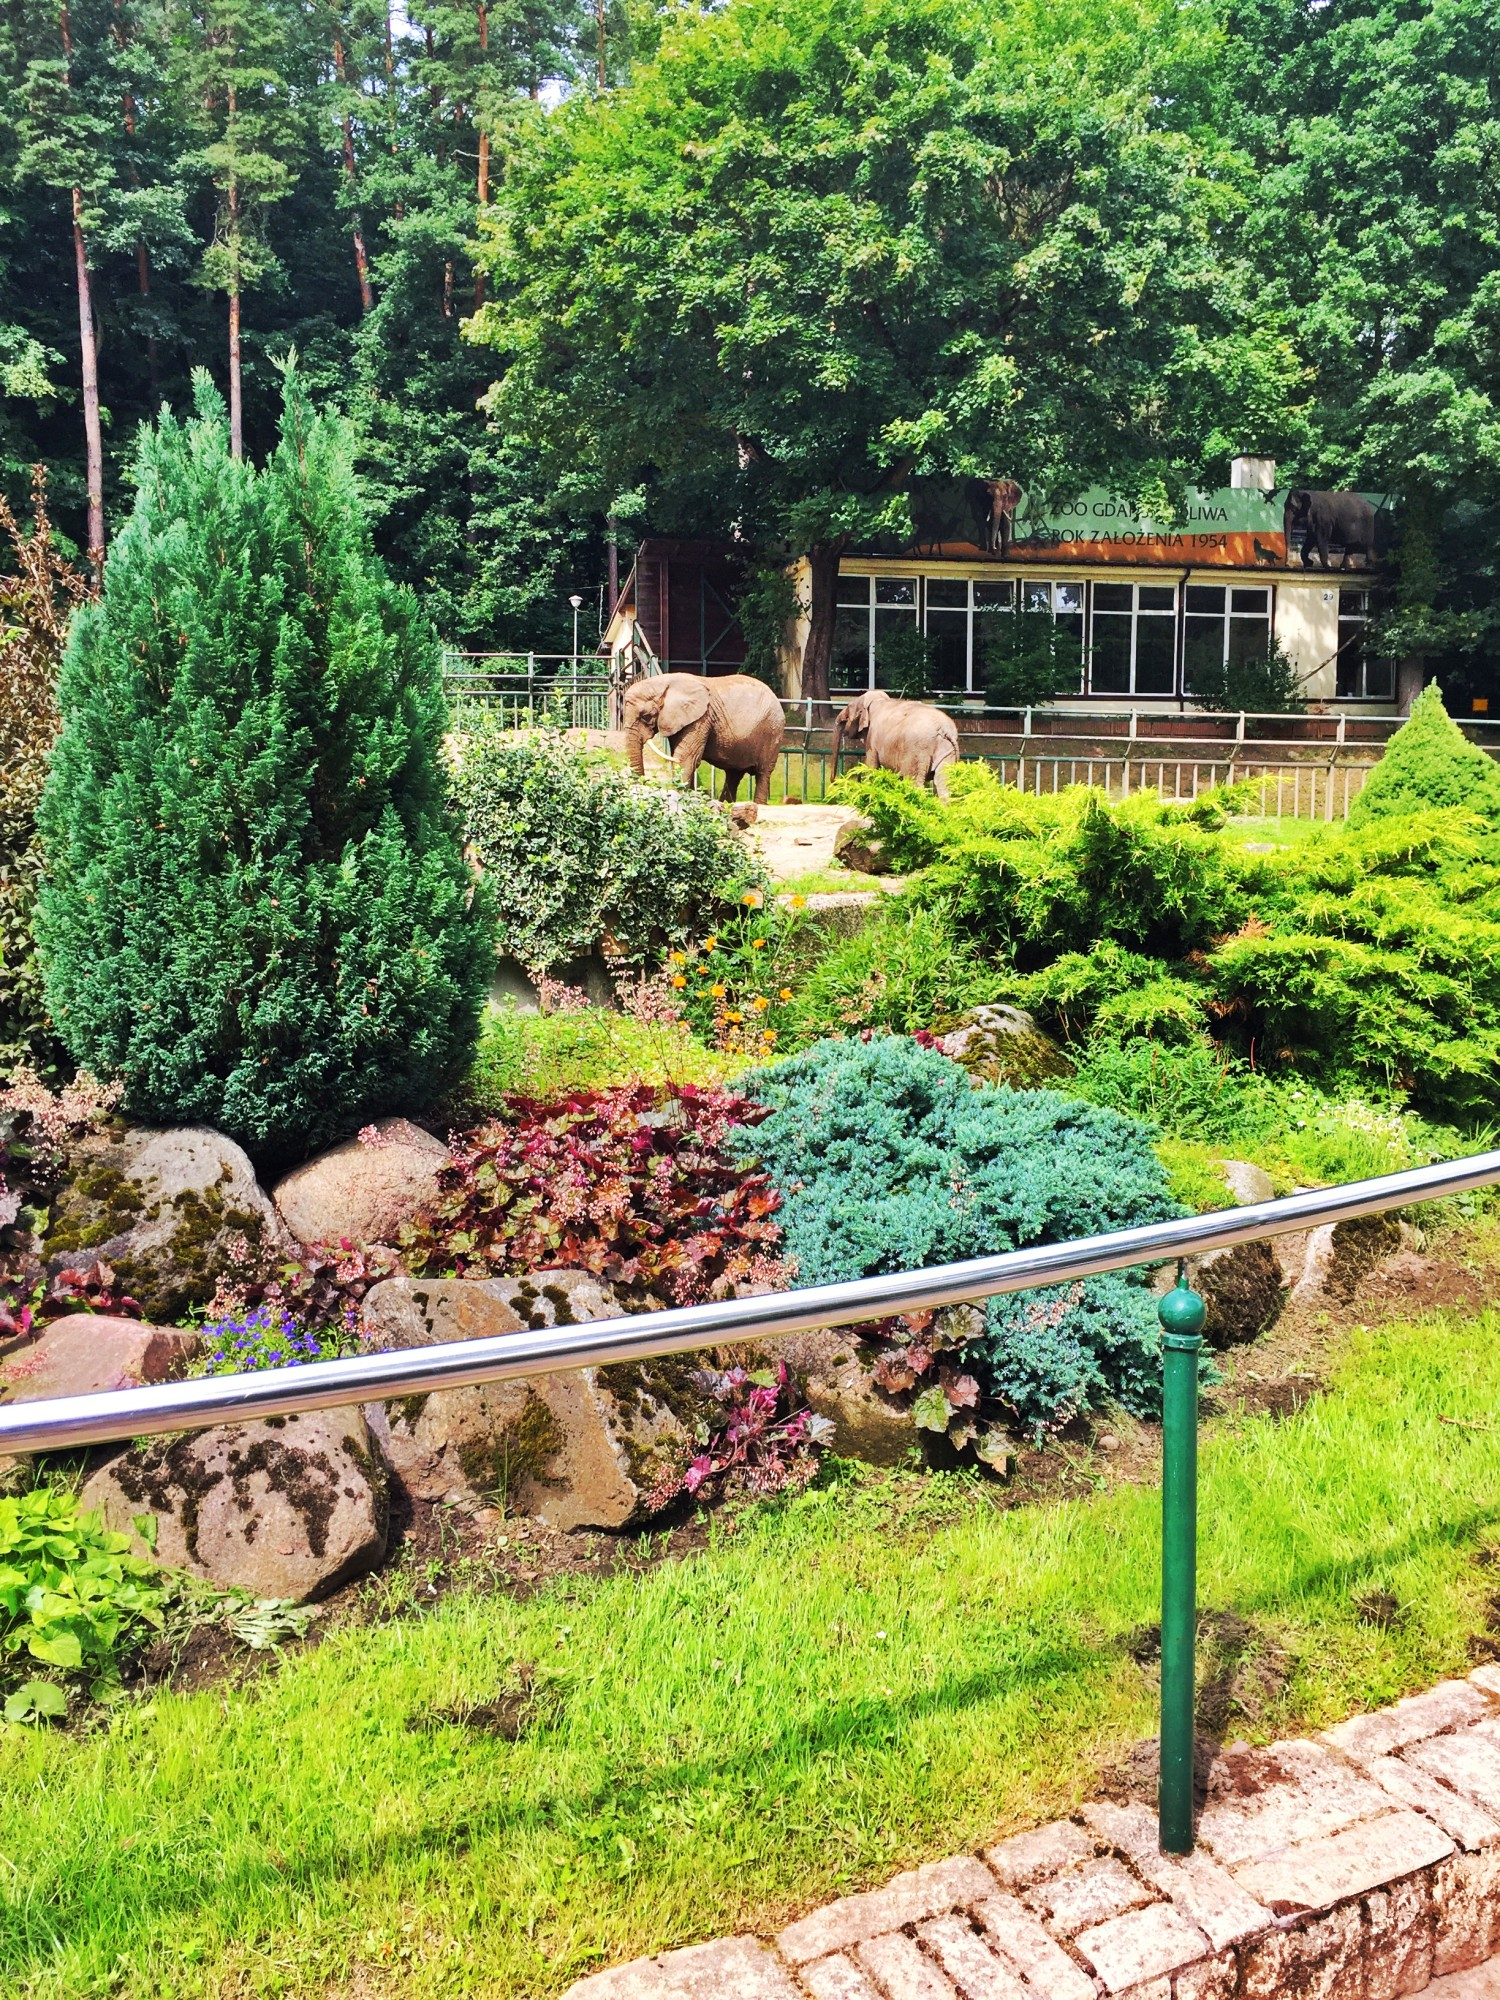 Zoo i Gdansk